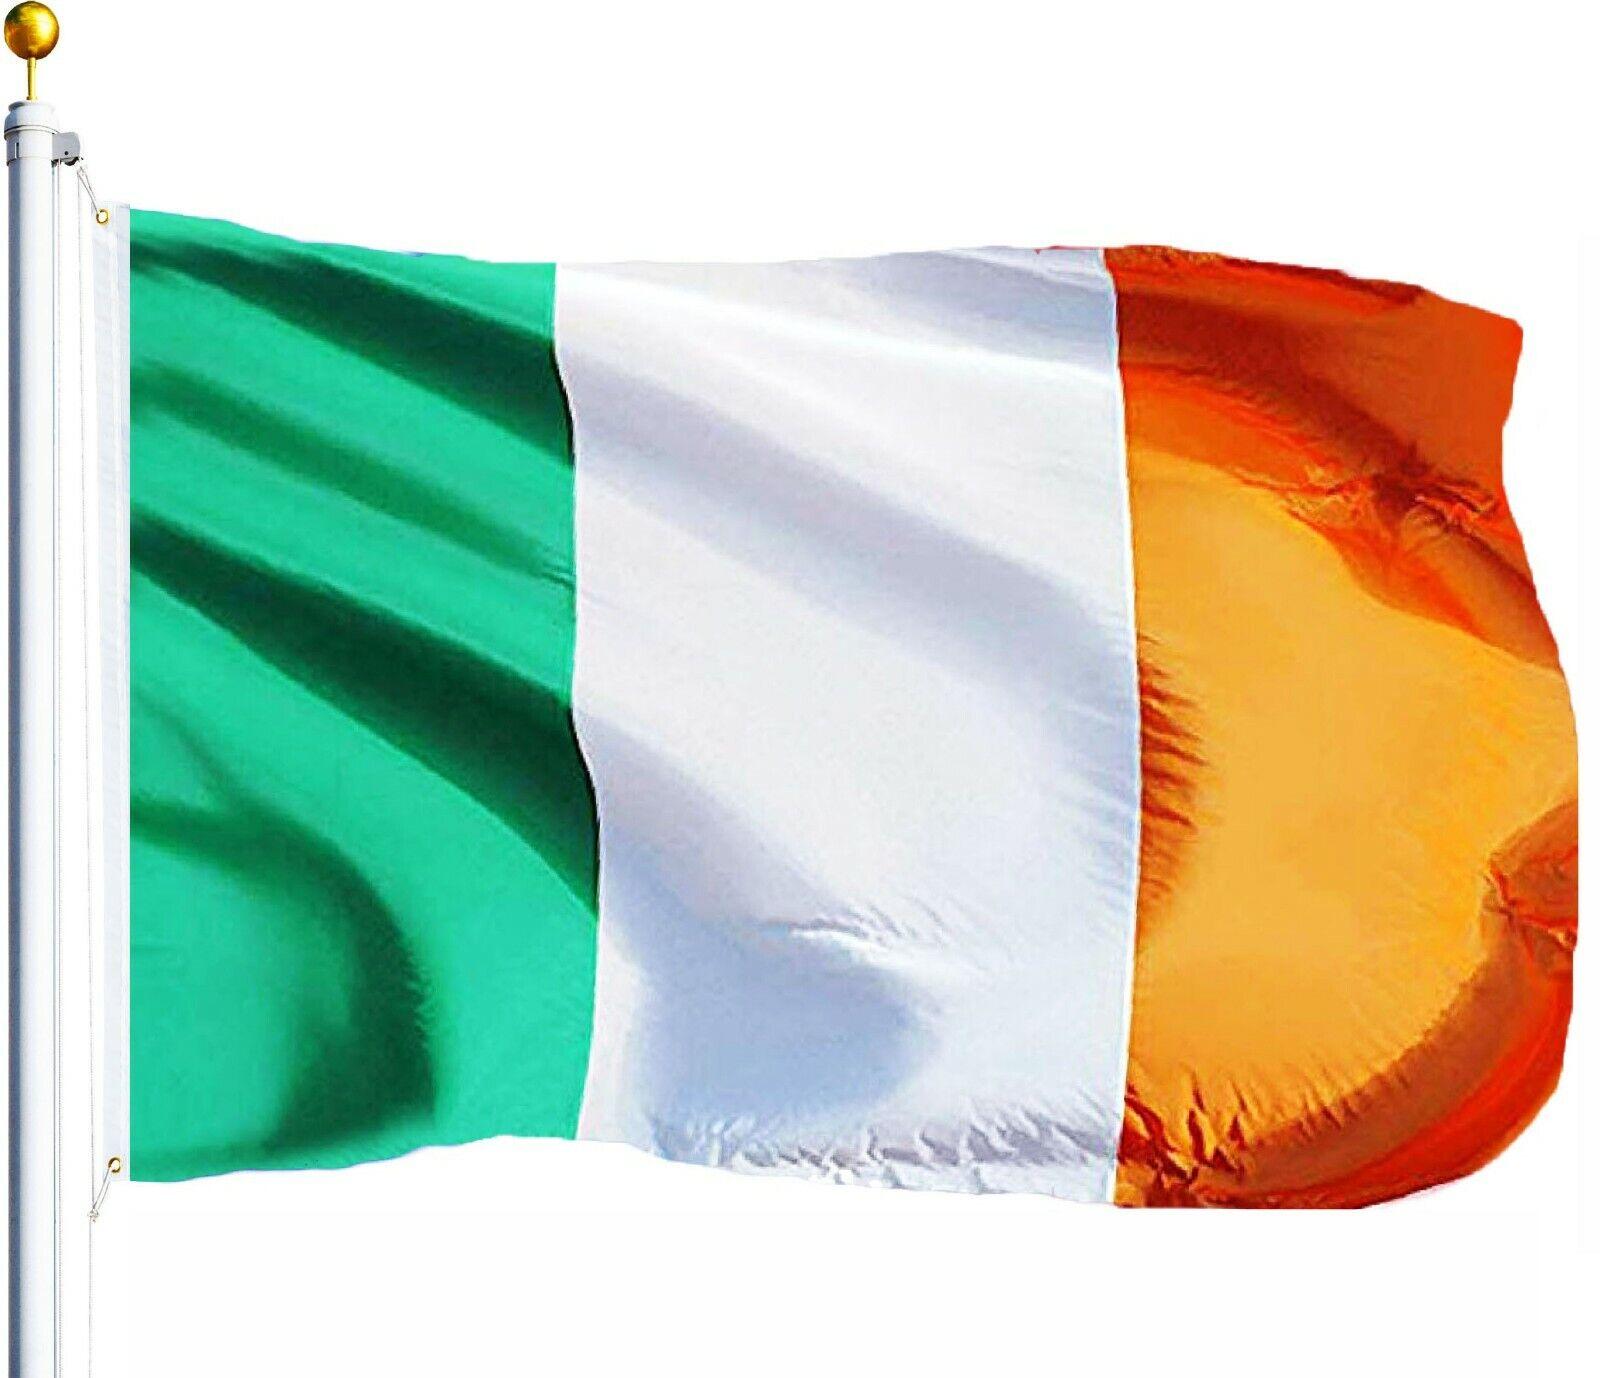 3X5 Ireland Flag 3'x5' Irish FLAG BANNER USA SELLER